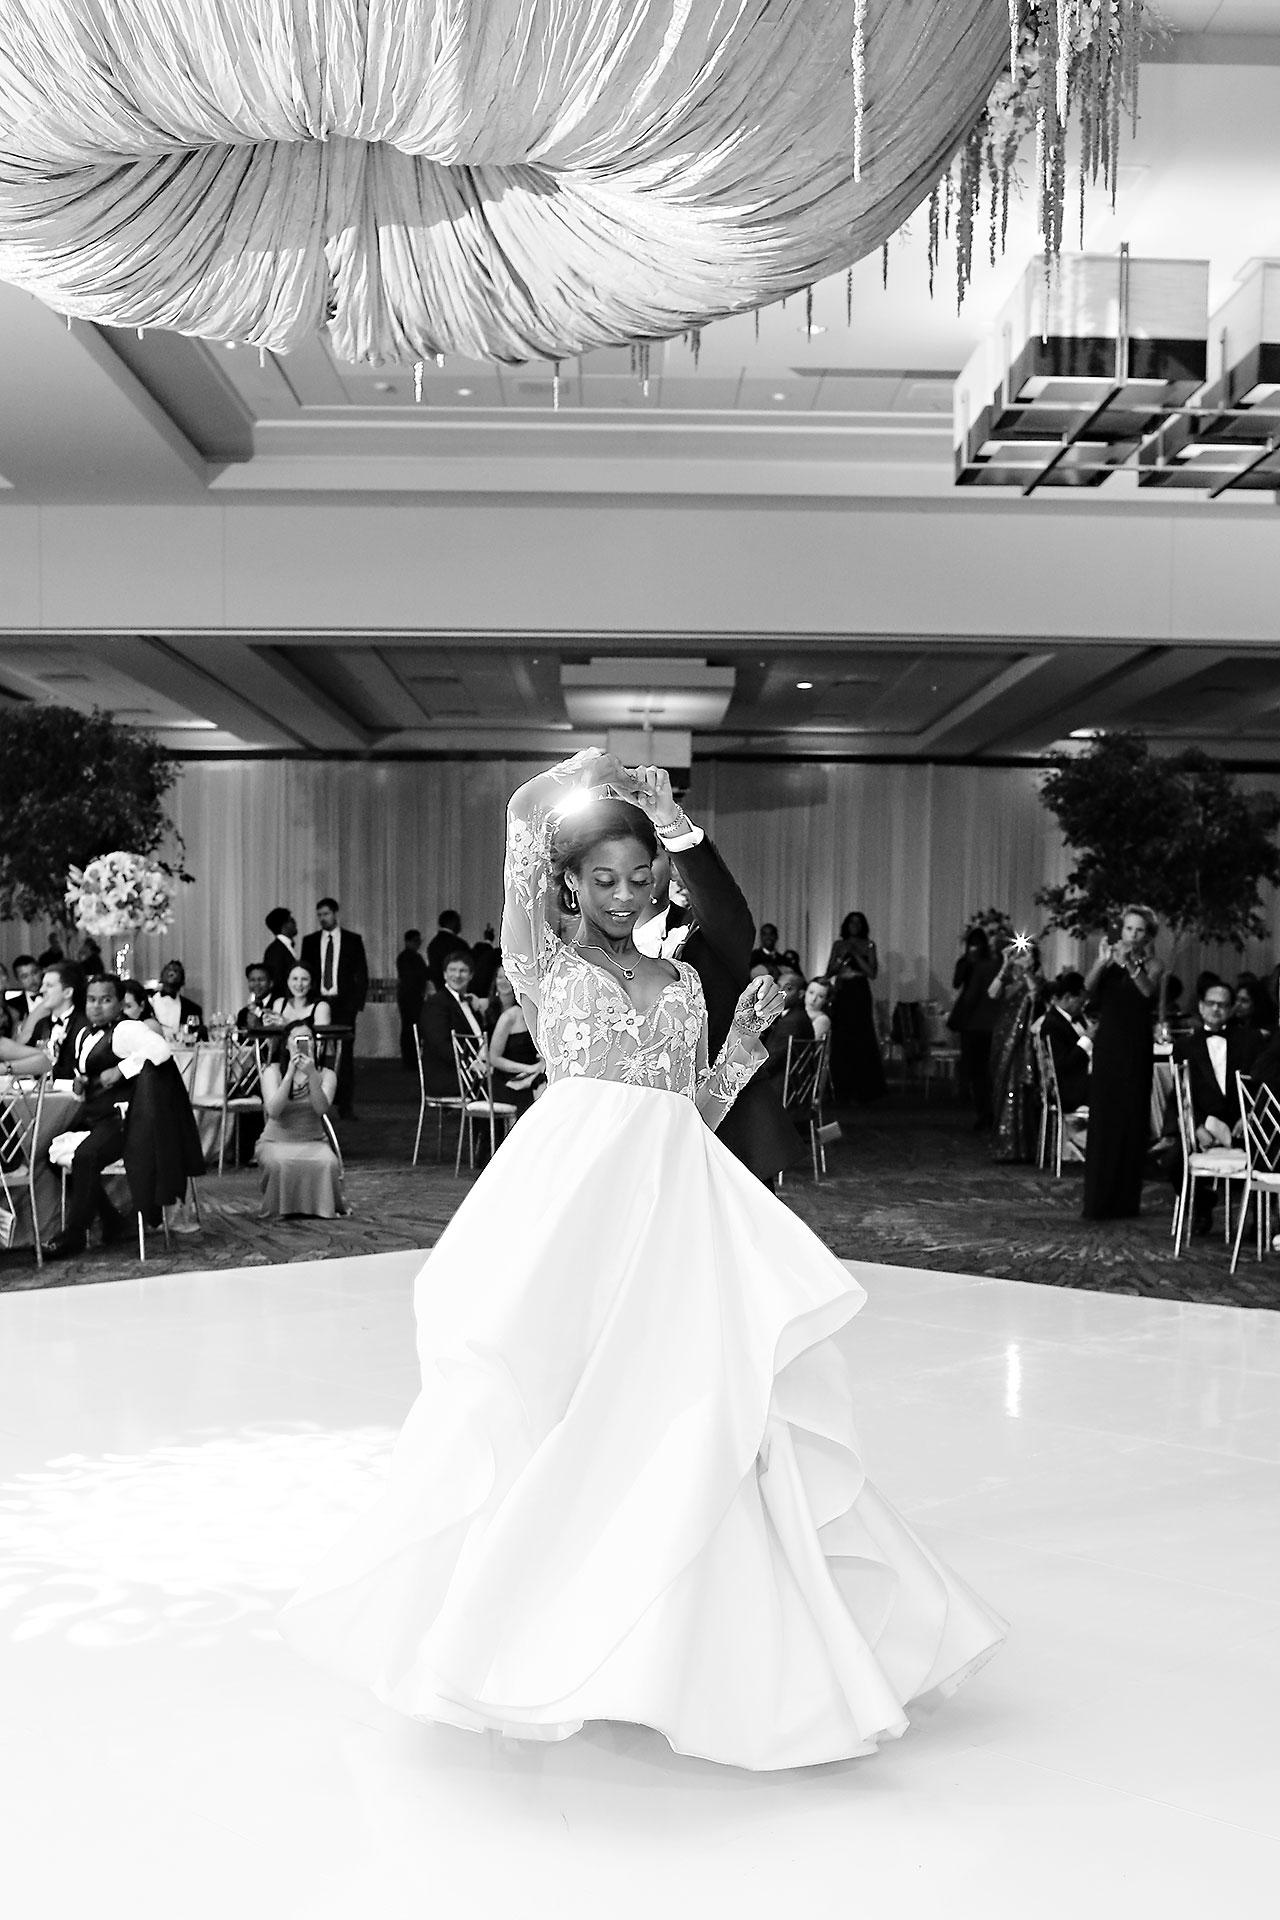 Joie Nikhil JW Marriott Indianapolis Wedding 114